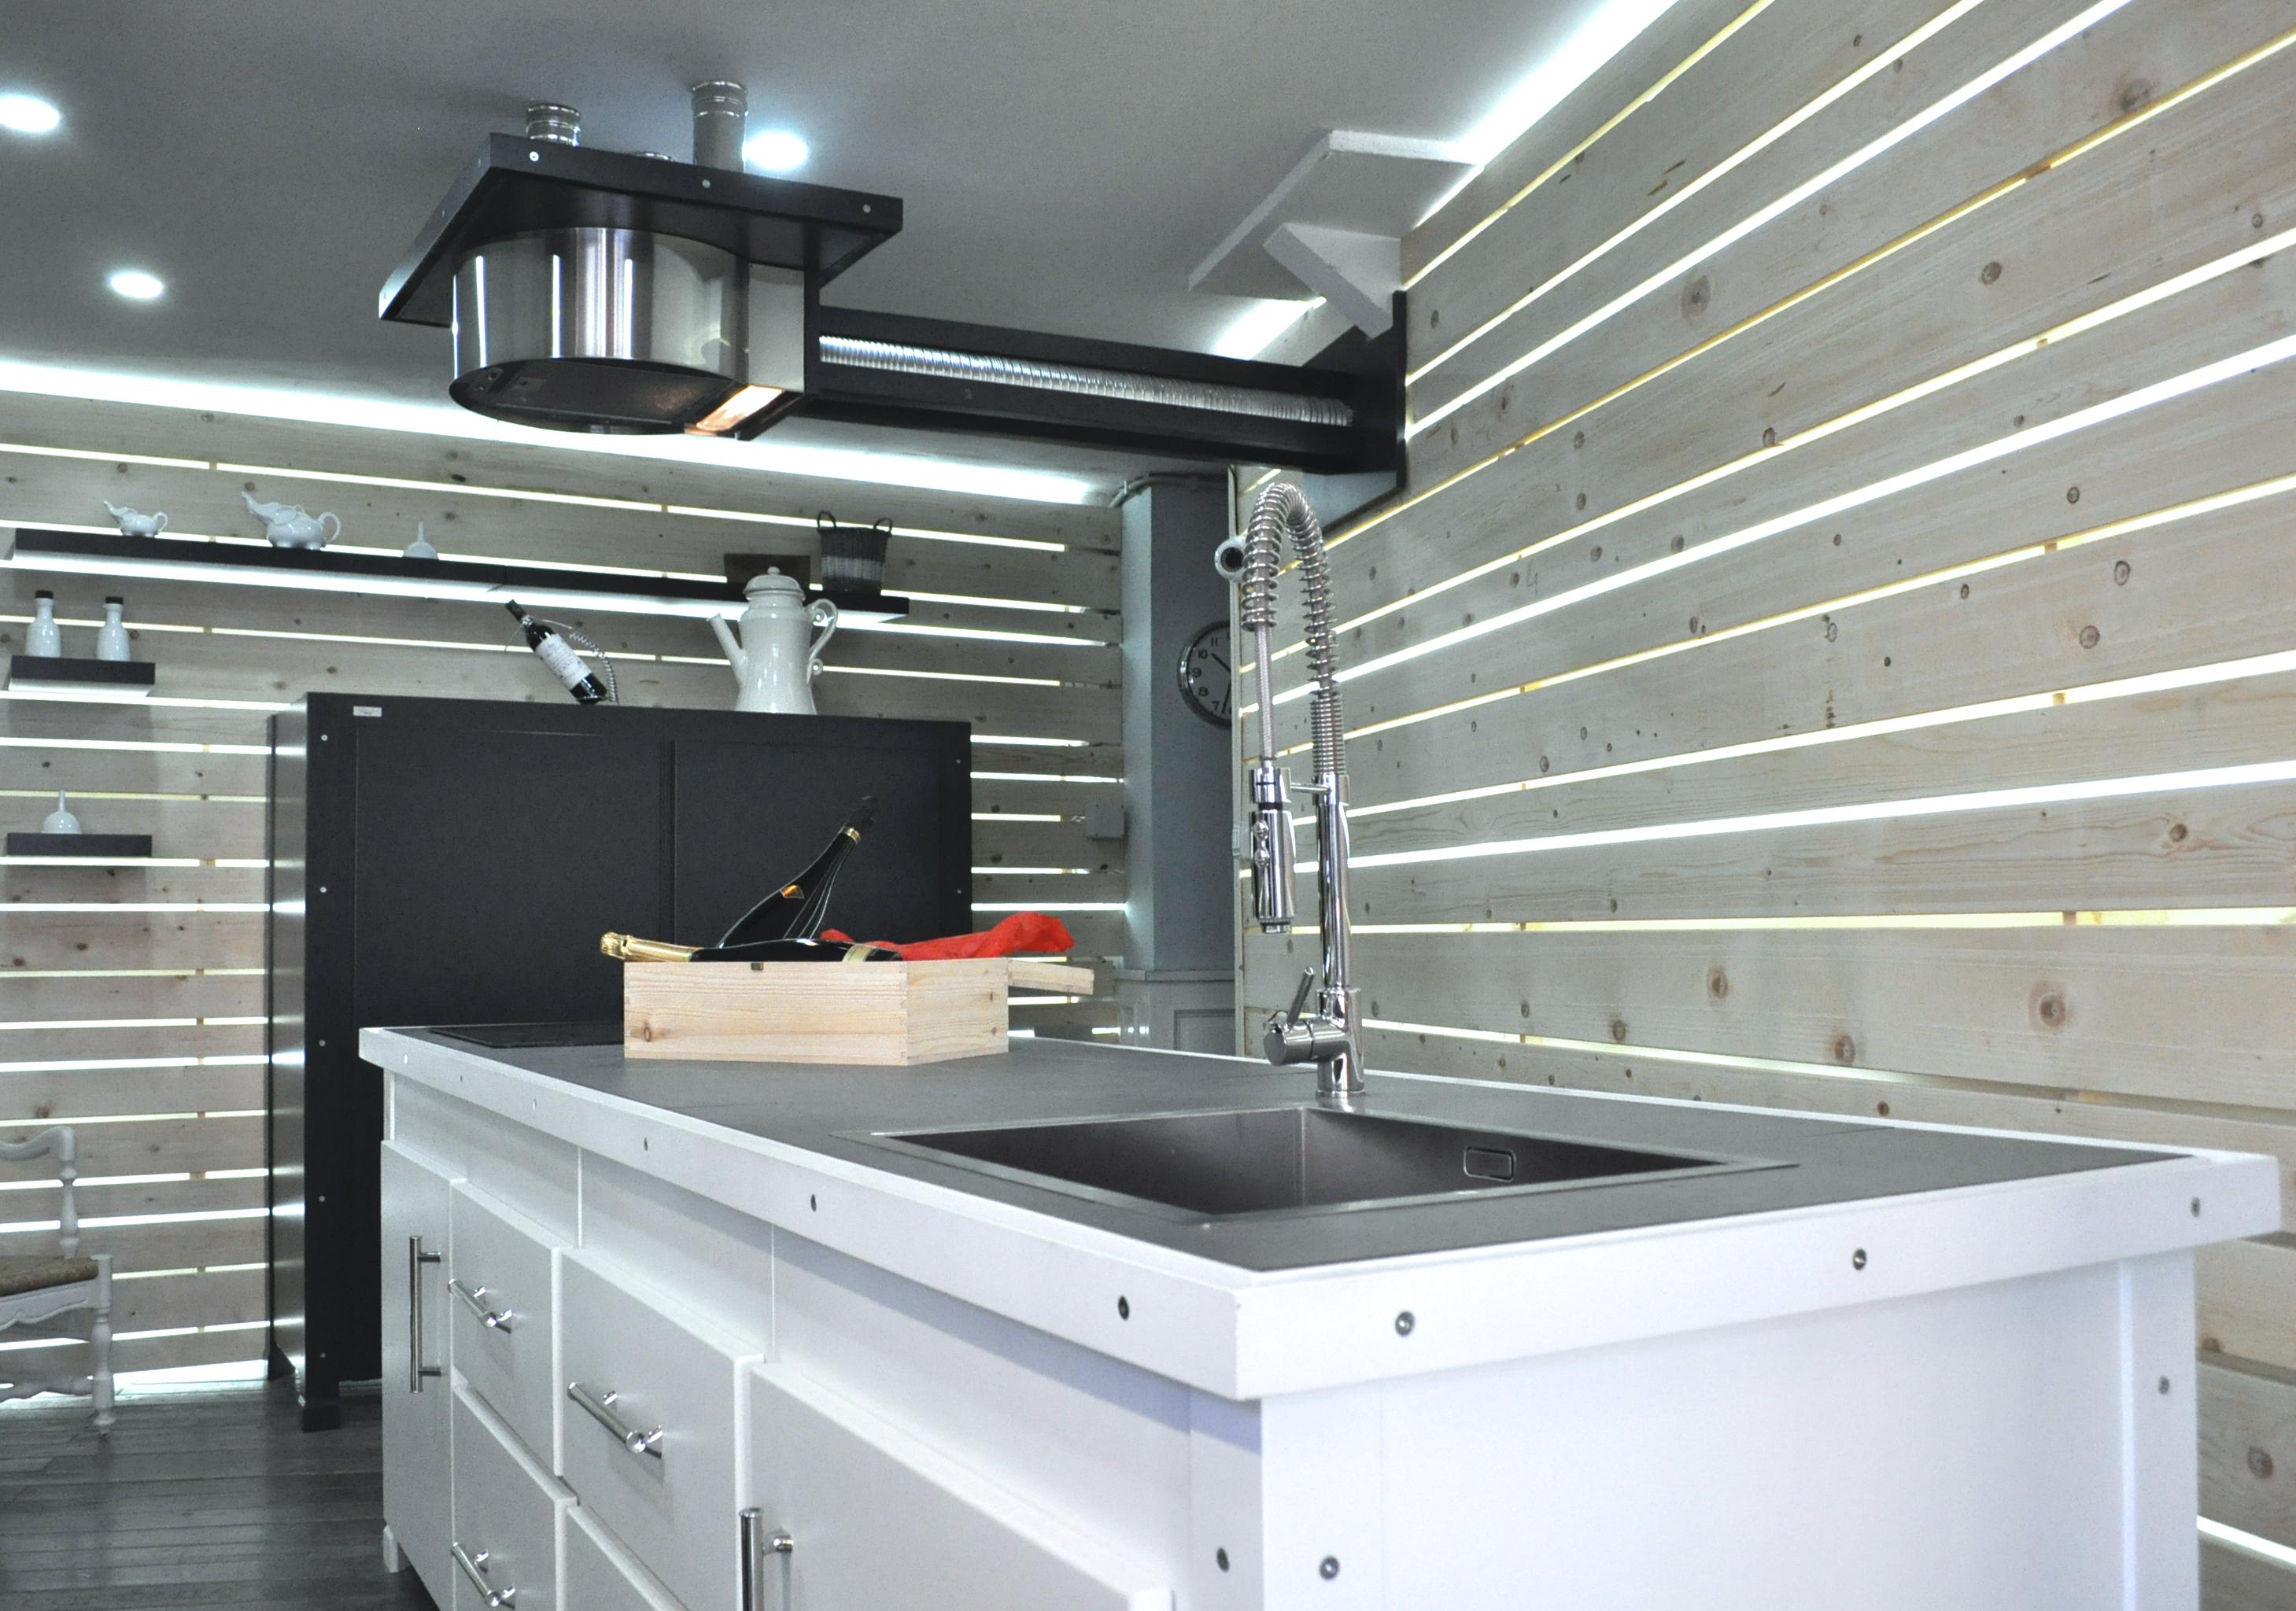 Cucina su misura Industrial-Falegnameria roma_1